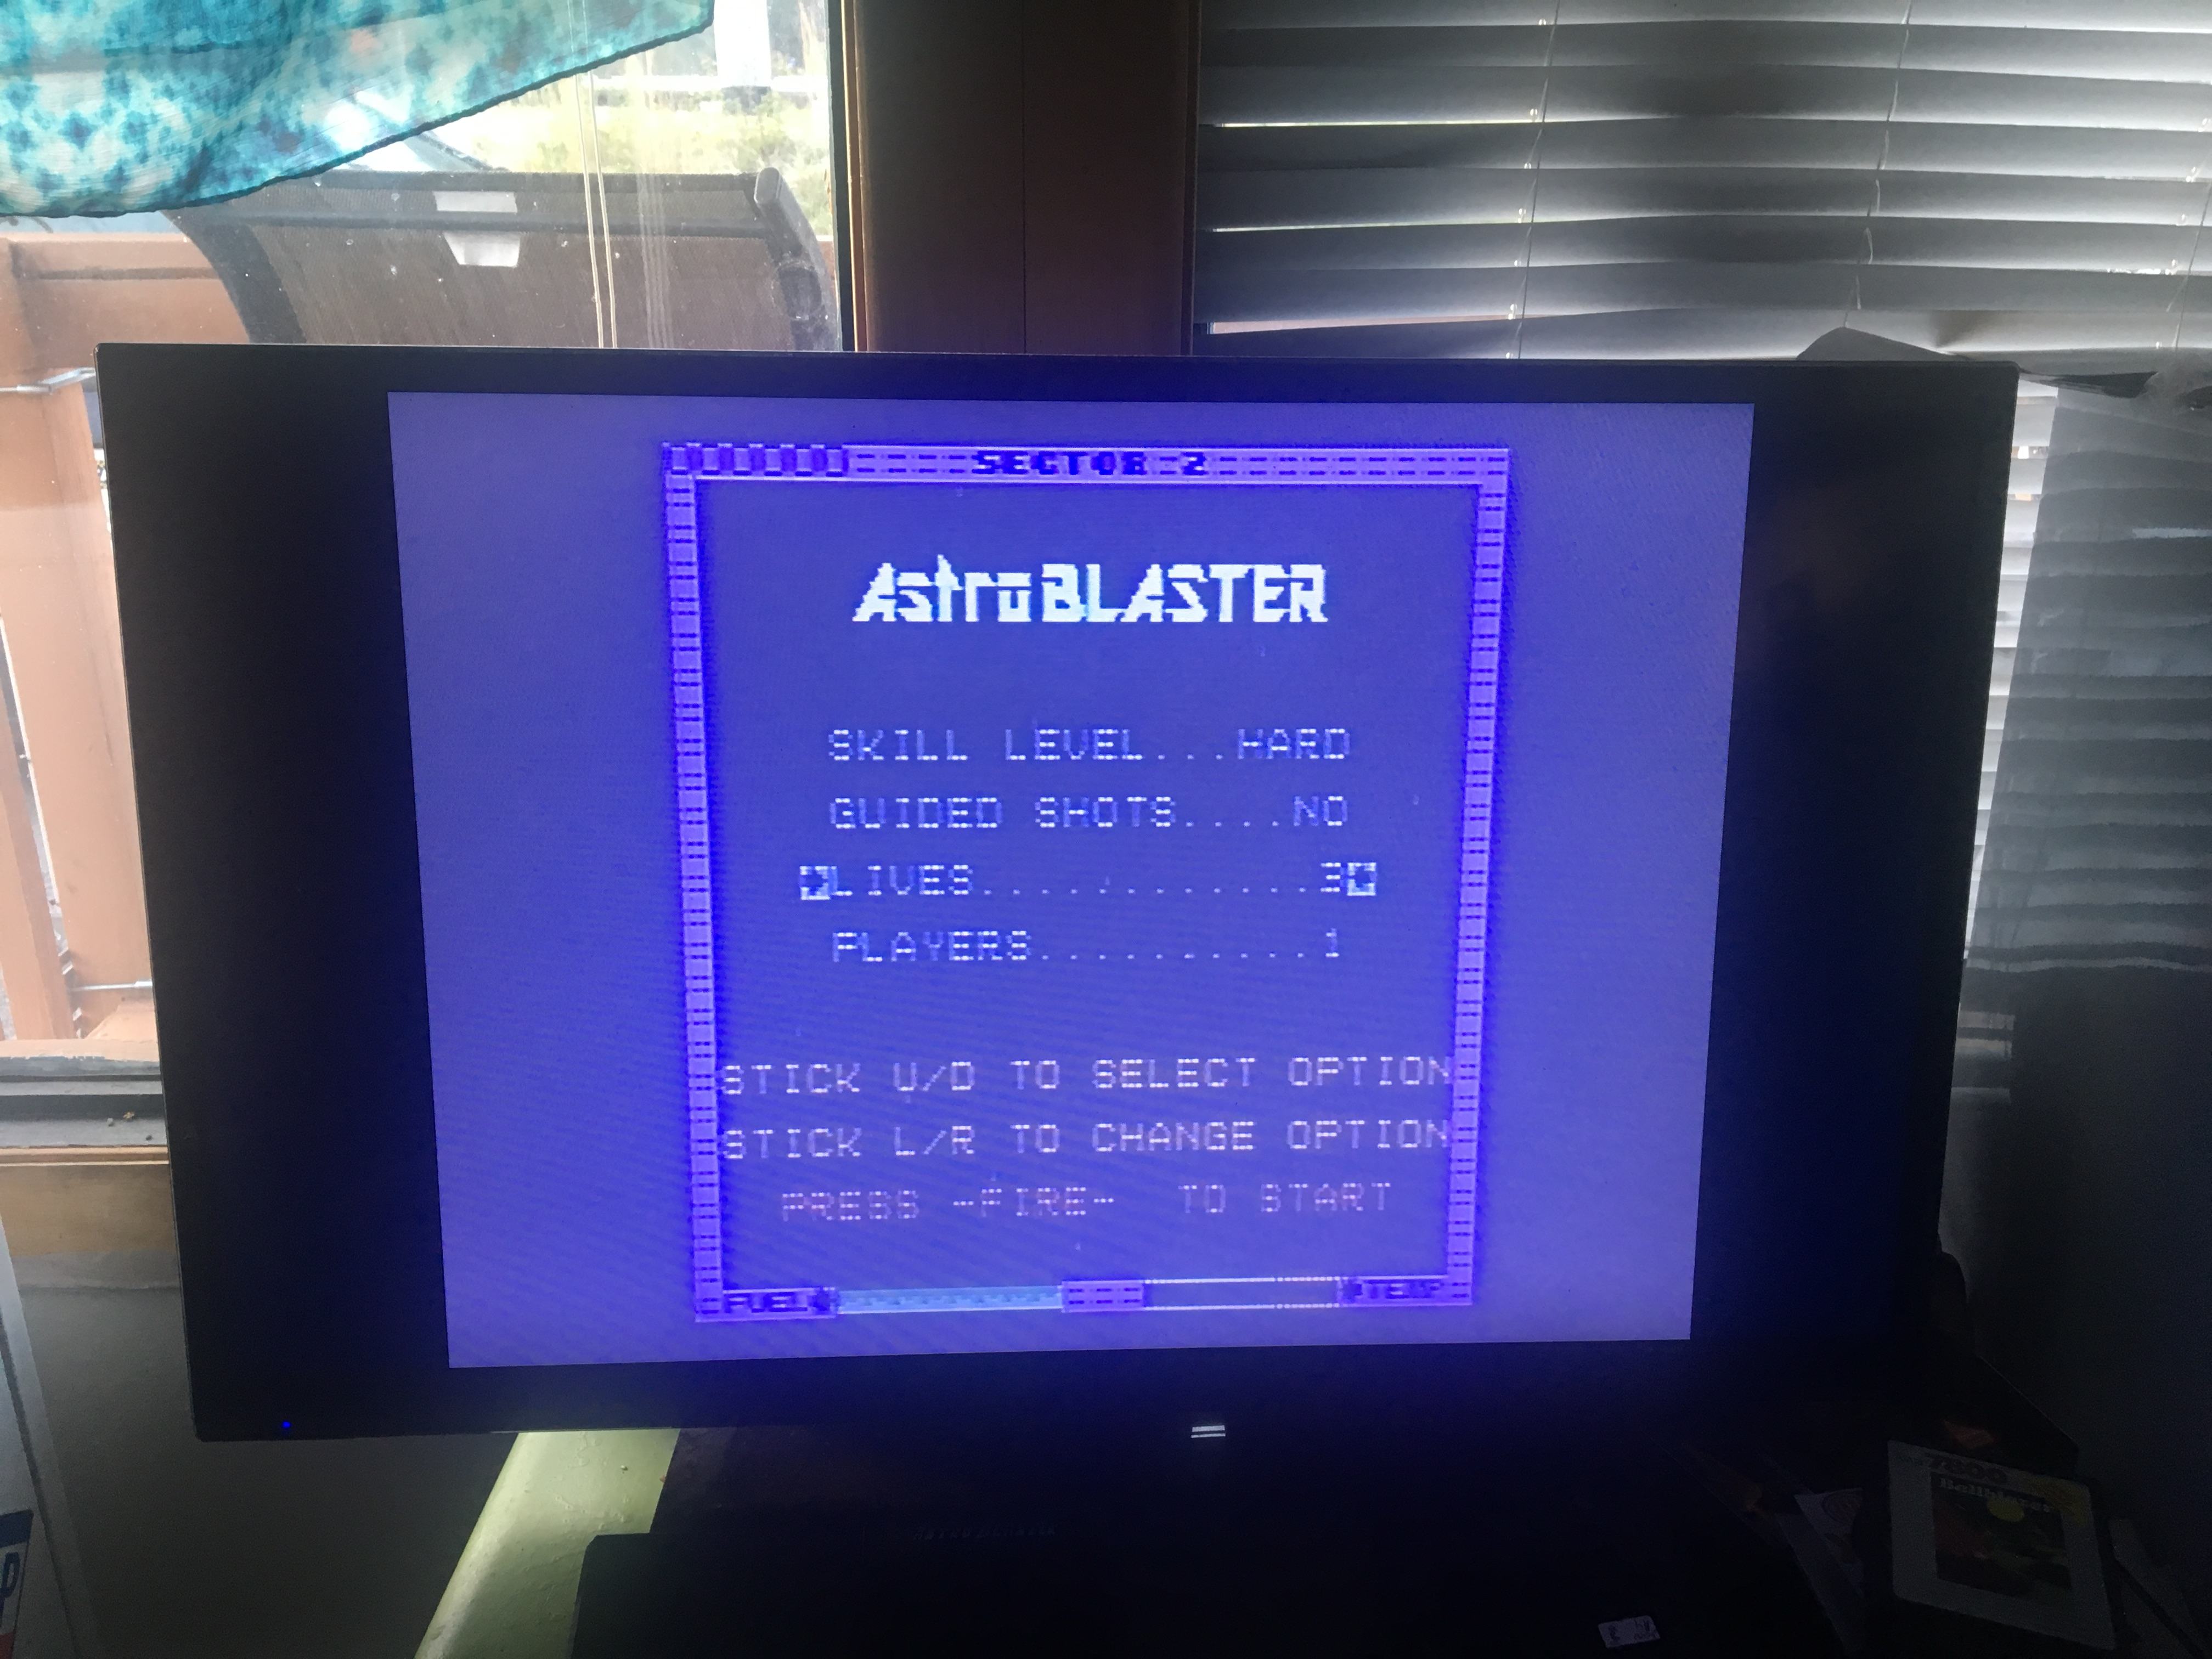 Astro Blaster [Hard]